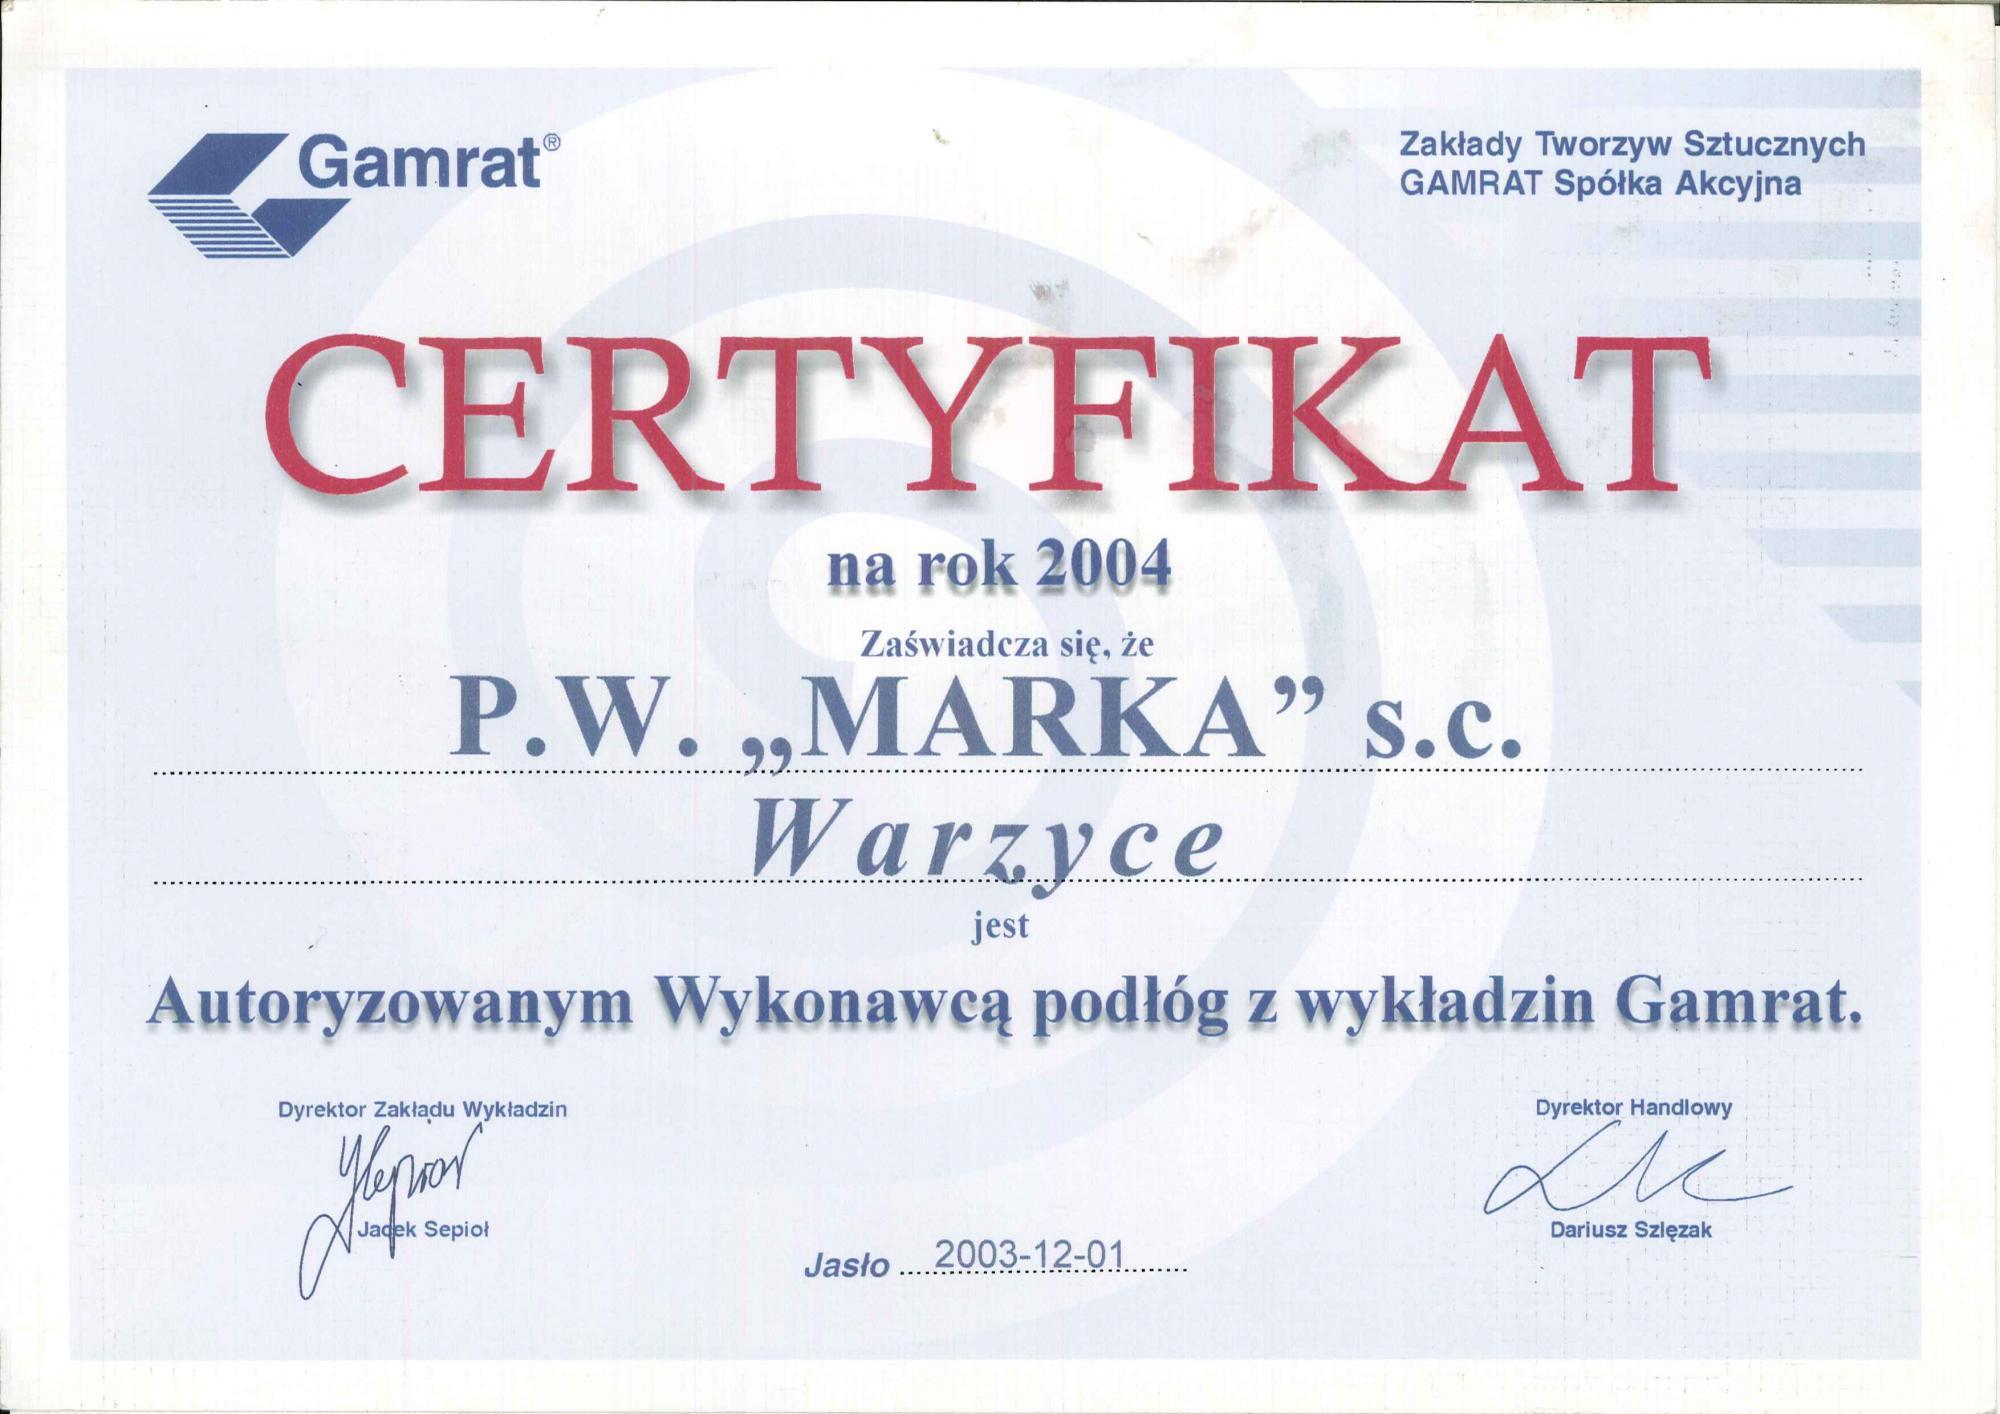 Certyfikat Gamrat 2004